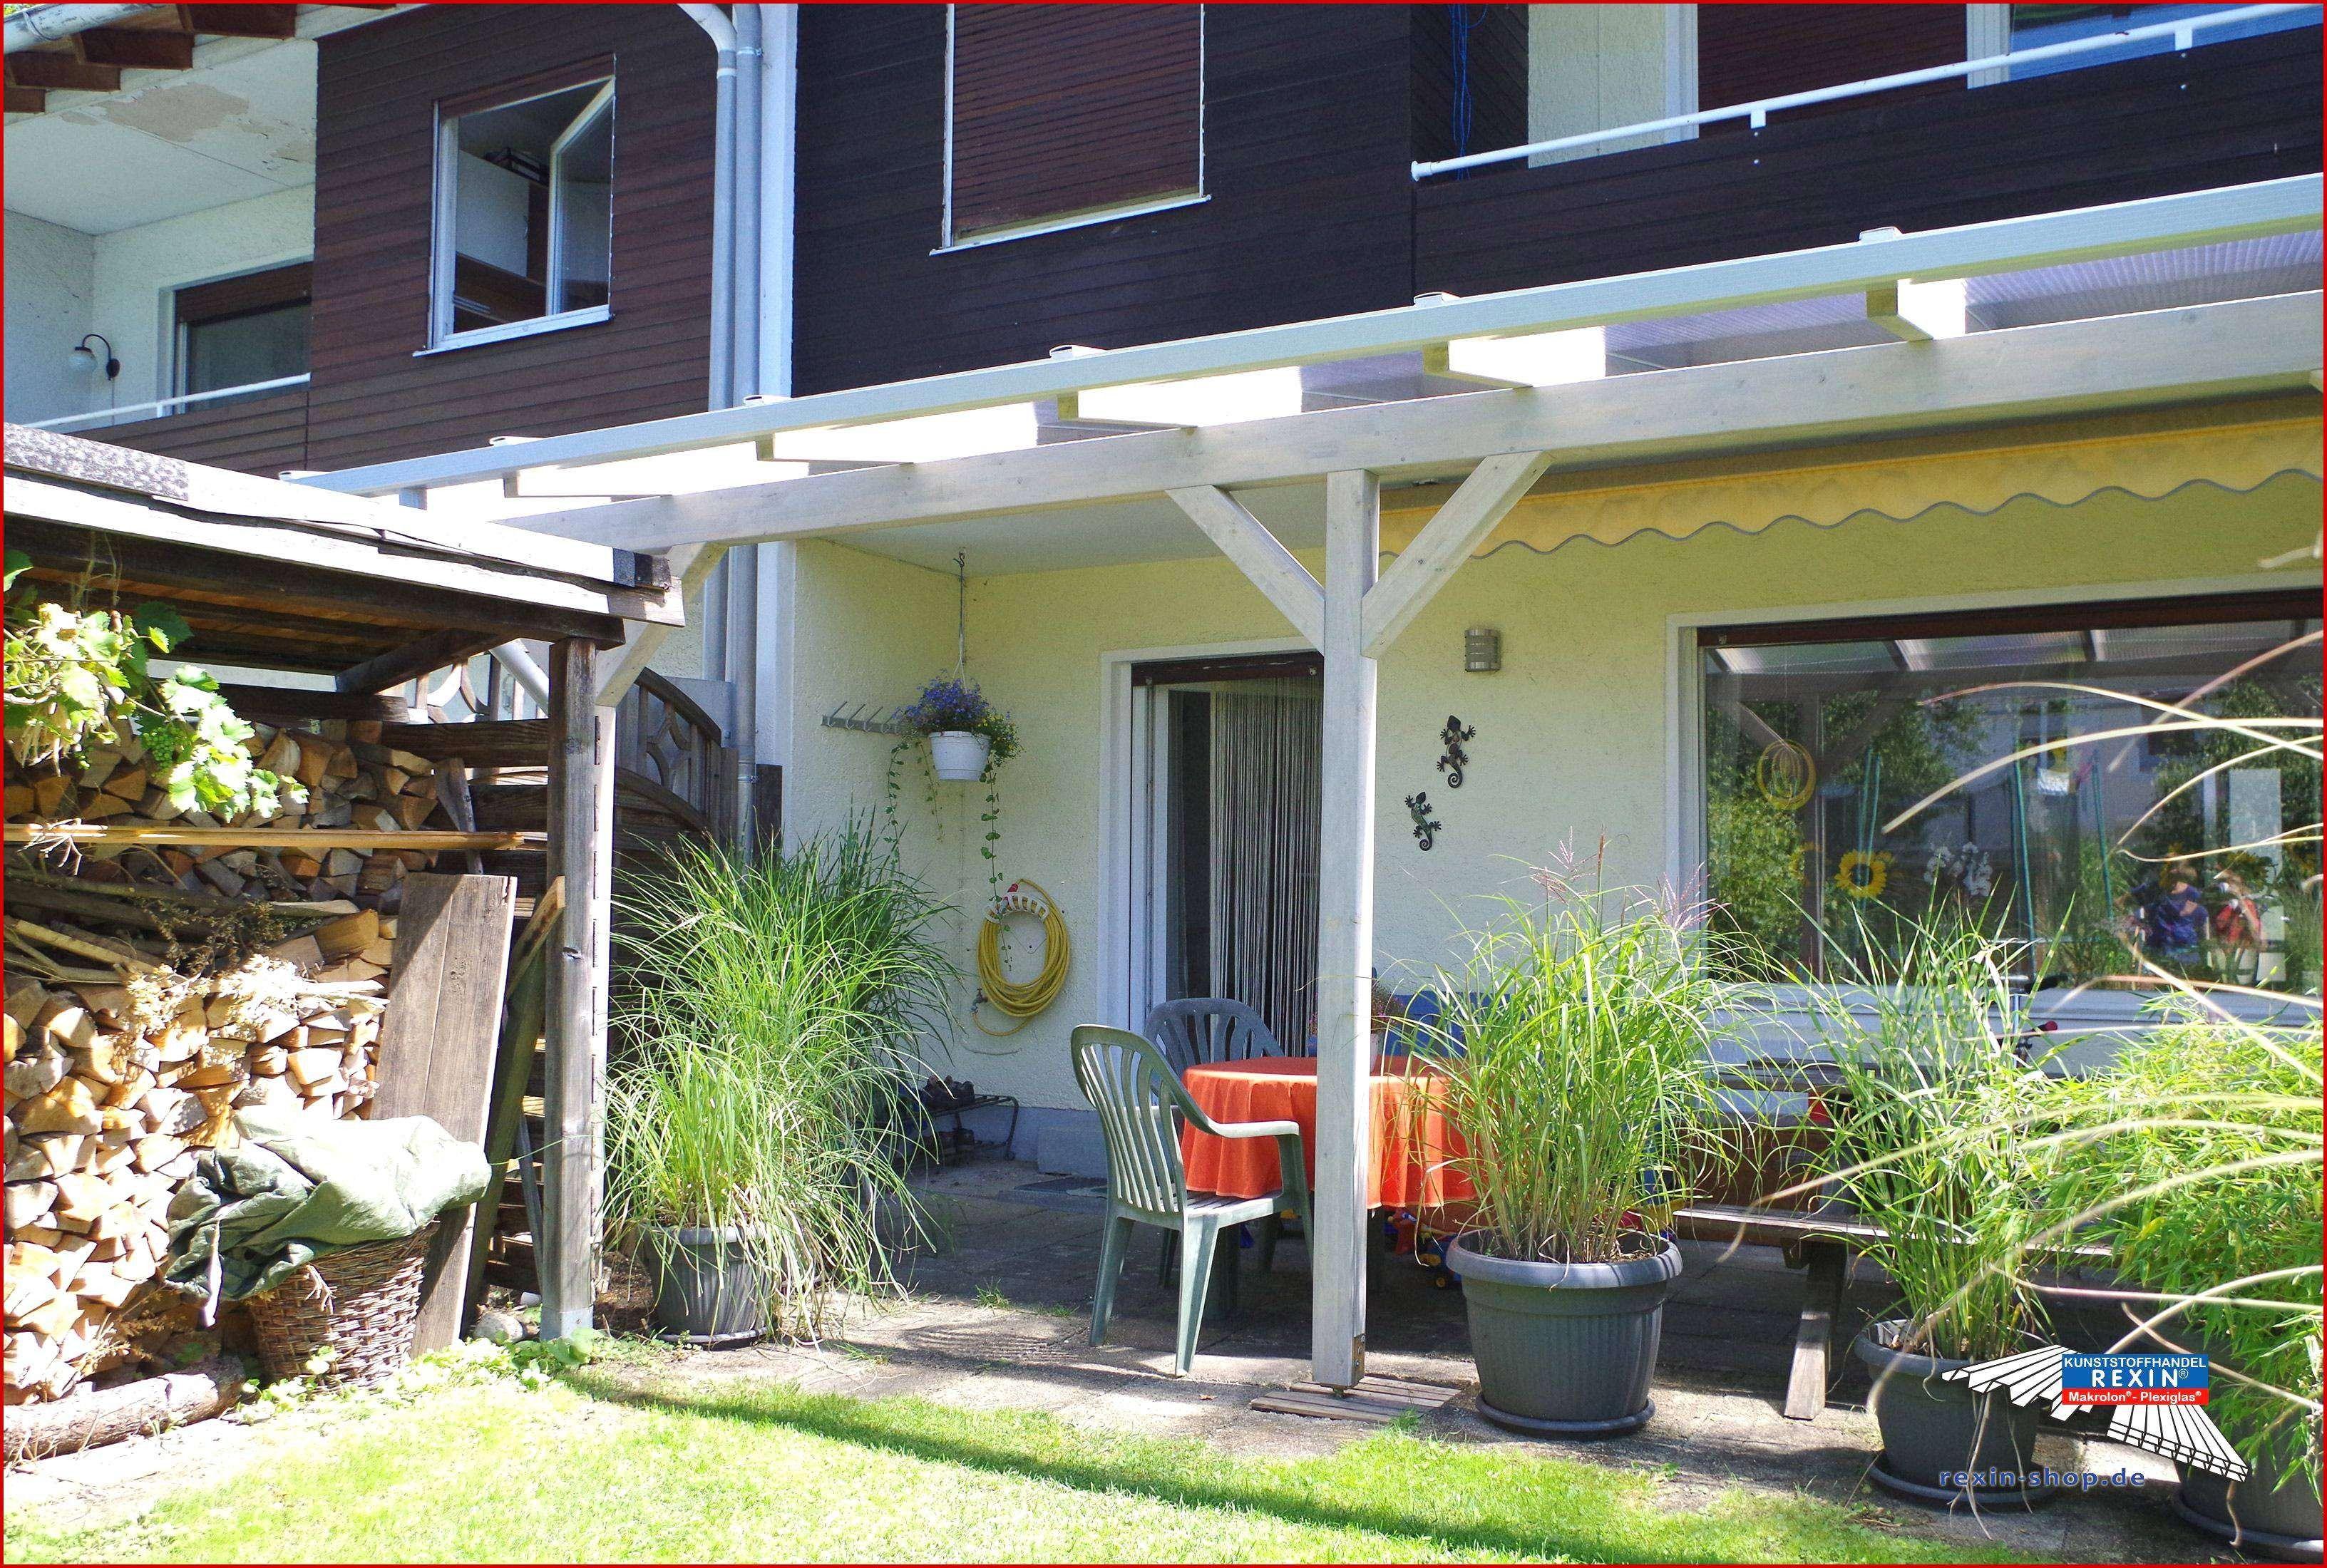 Design 43 Zum Hochbeet Uberdachung Selber Bauen Outdoor Decor Outdoor Structures Pergola